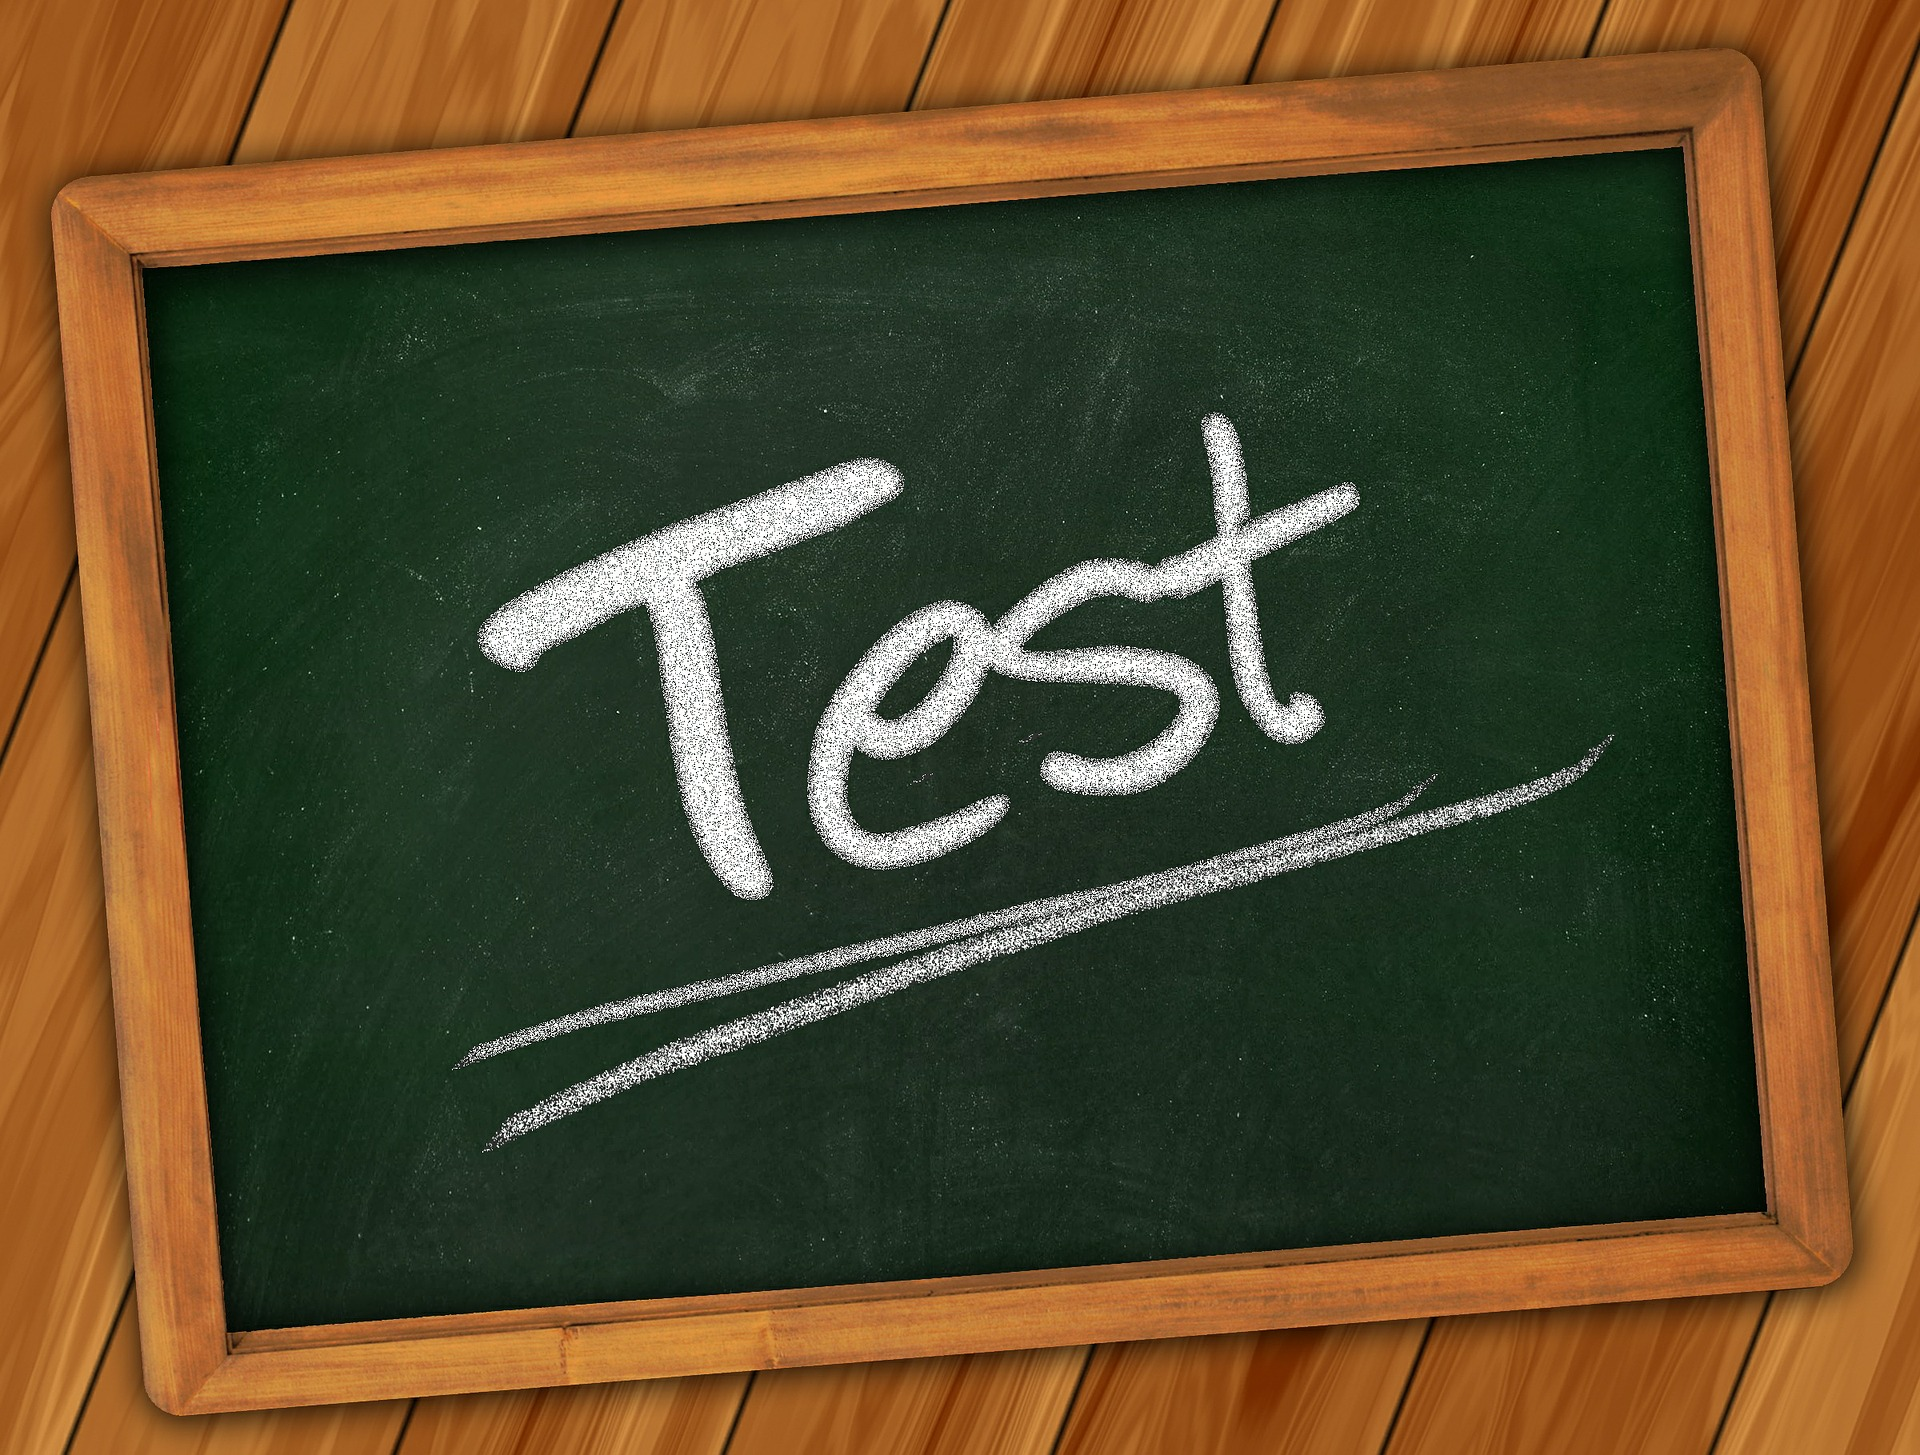 Credit Card Banks: Not Stressing Stress Tests